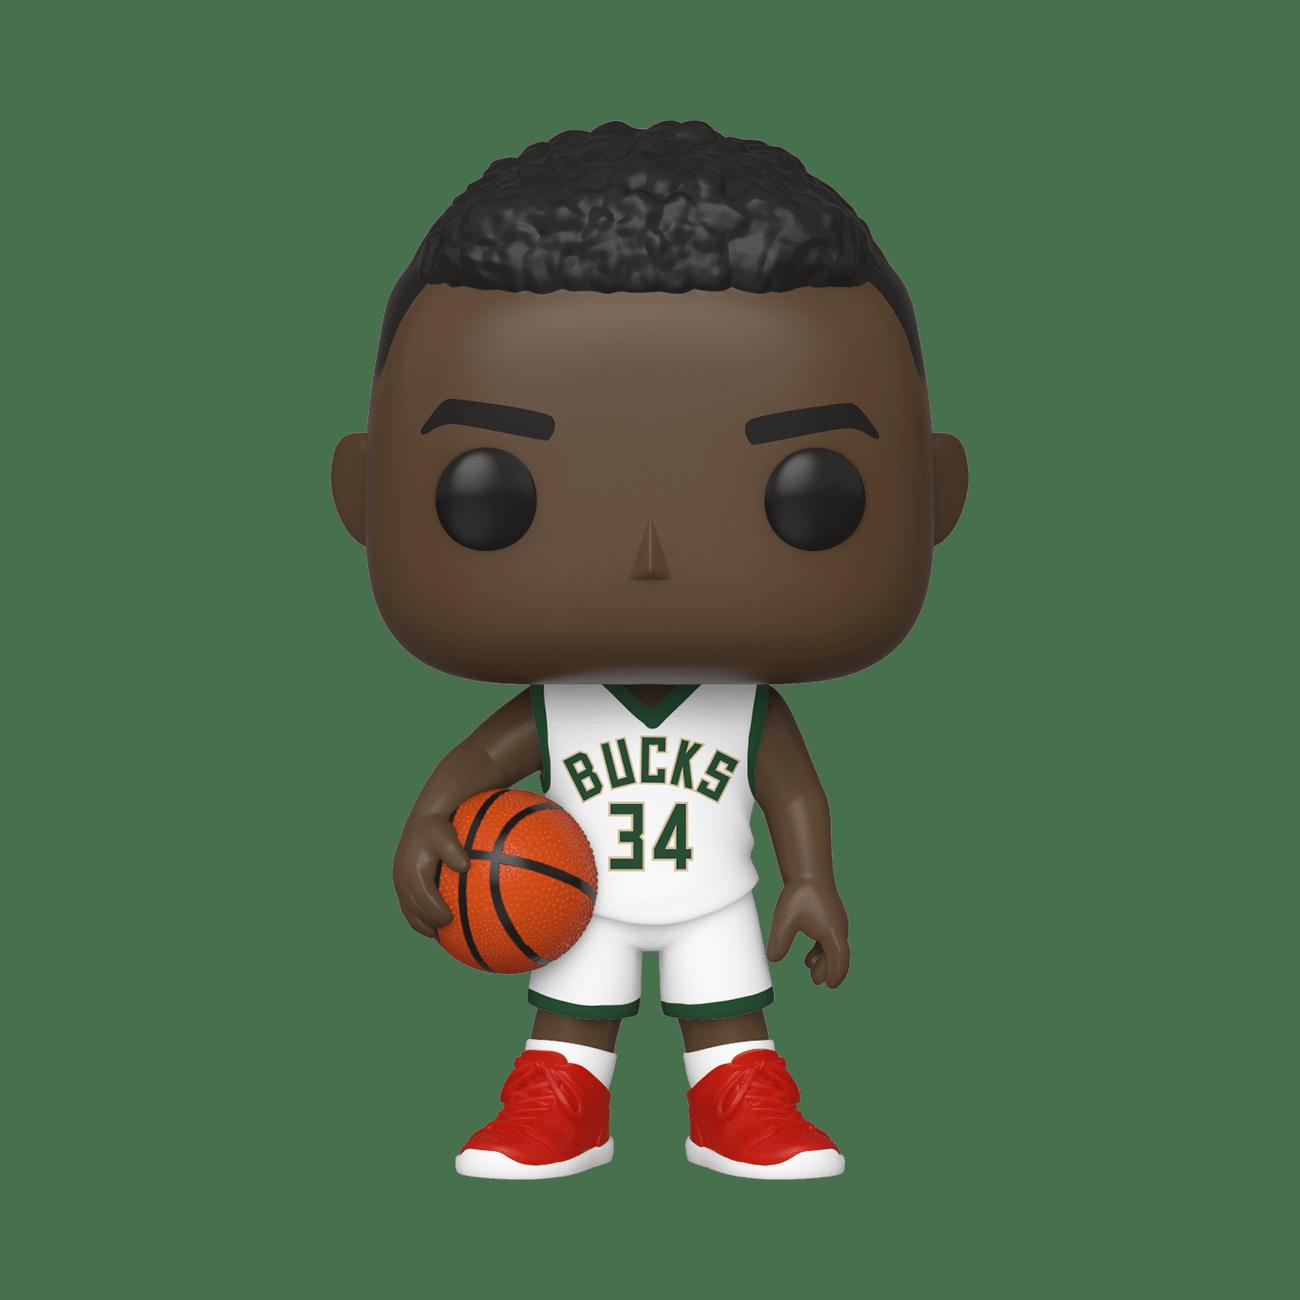 NBA: Bucks Giannis Antetokounmpo POP! Vinyl Figure